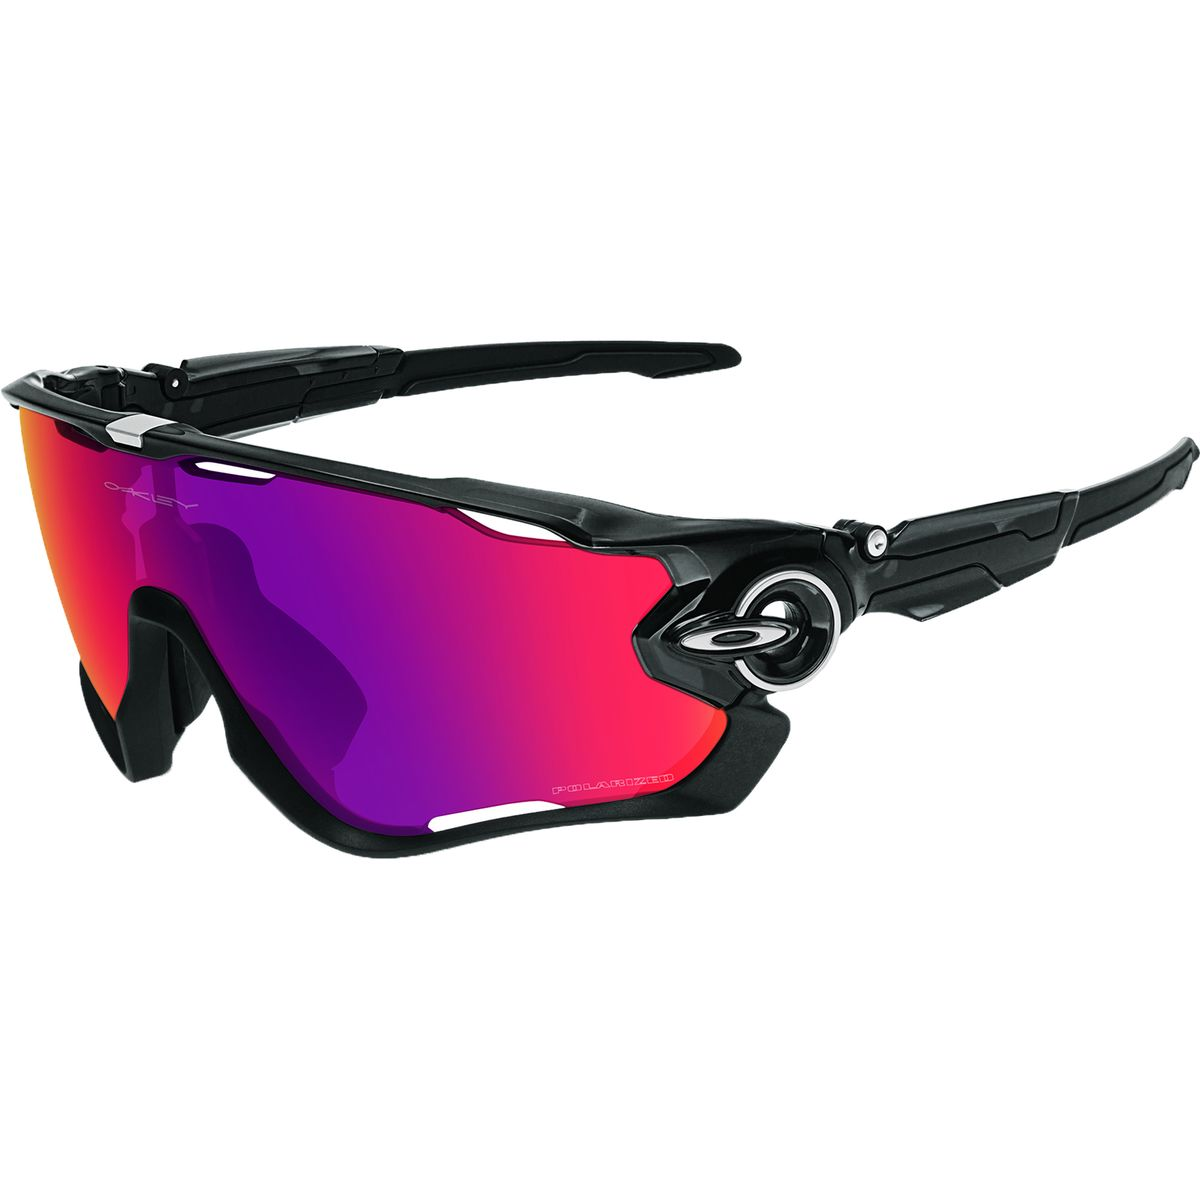 Oakley Cycling Sunglasses Jawbreaker « Heritage Malta 5b069b4df